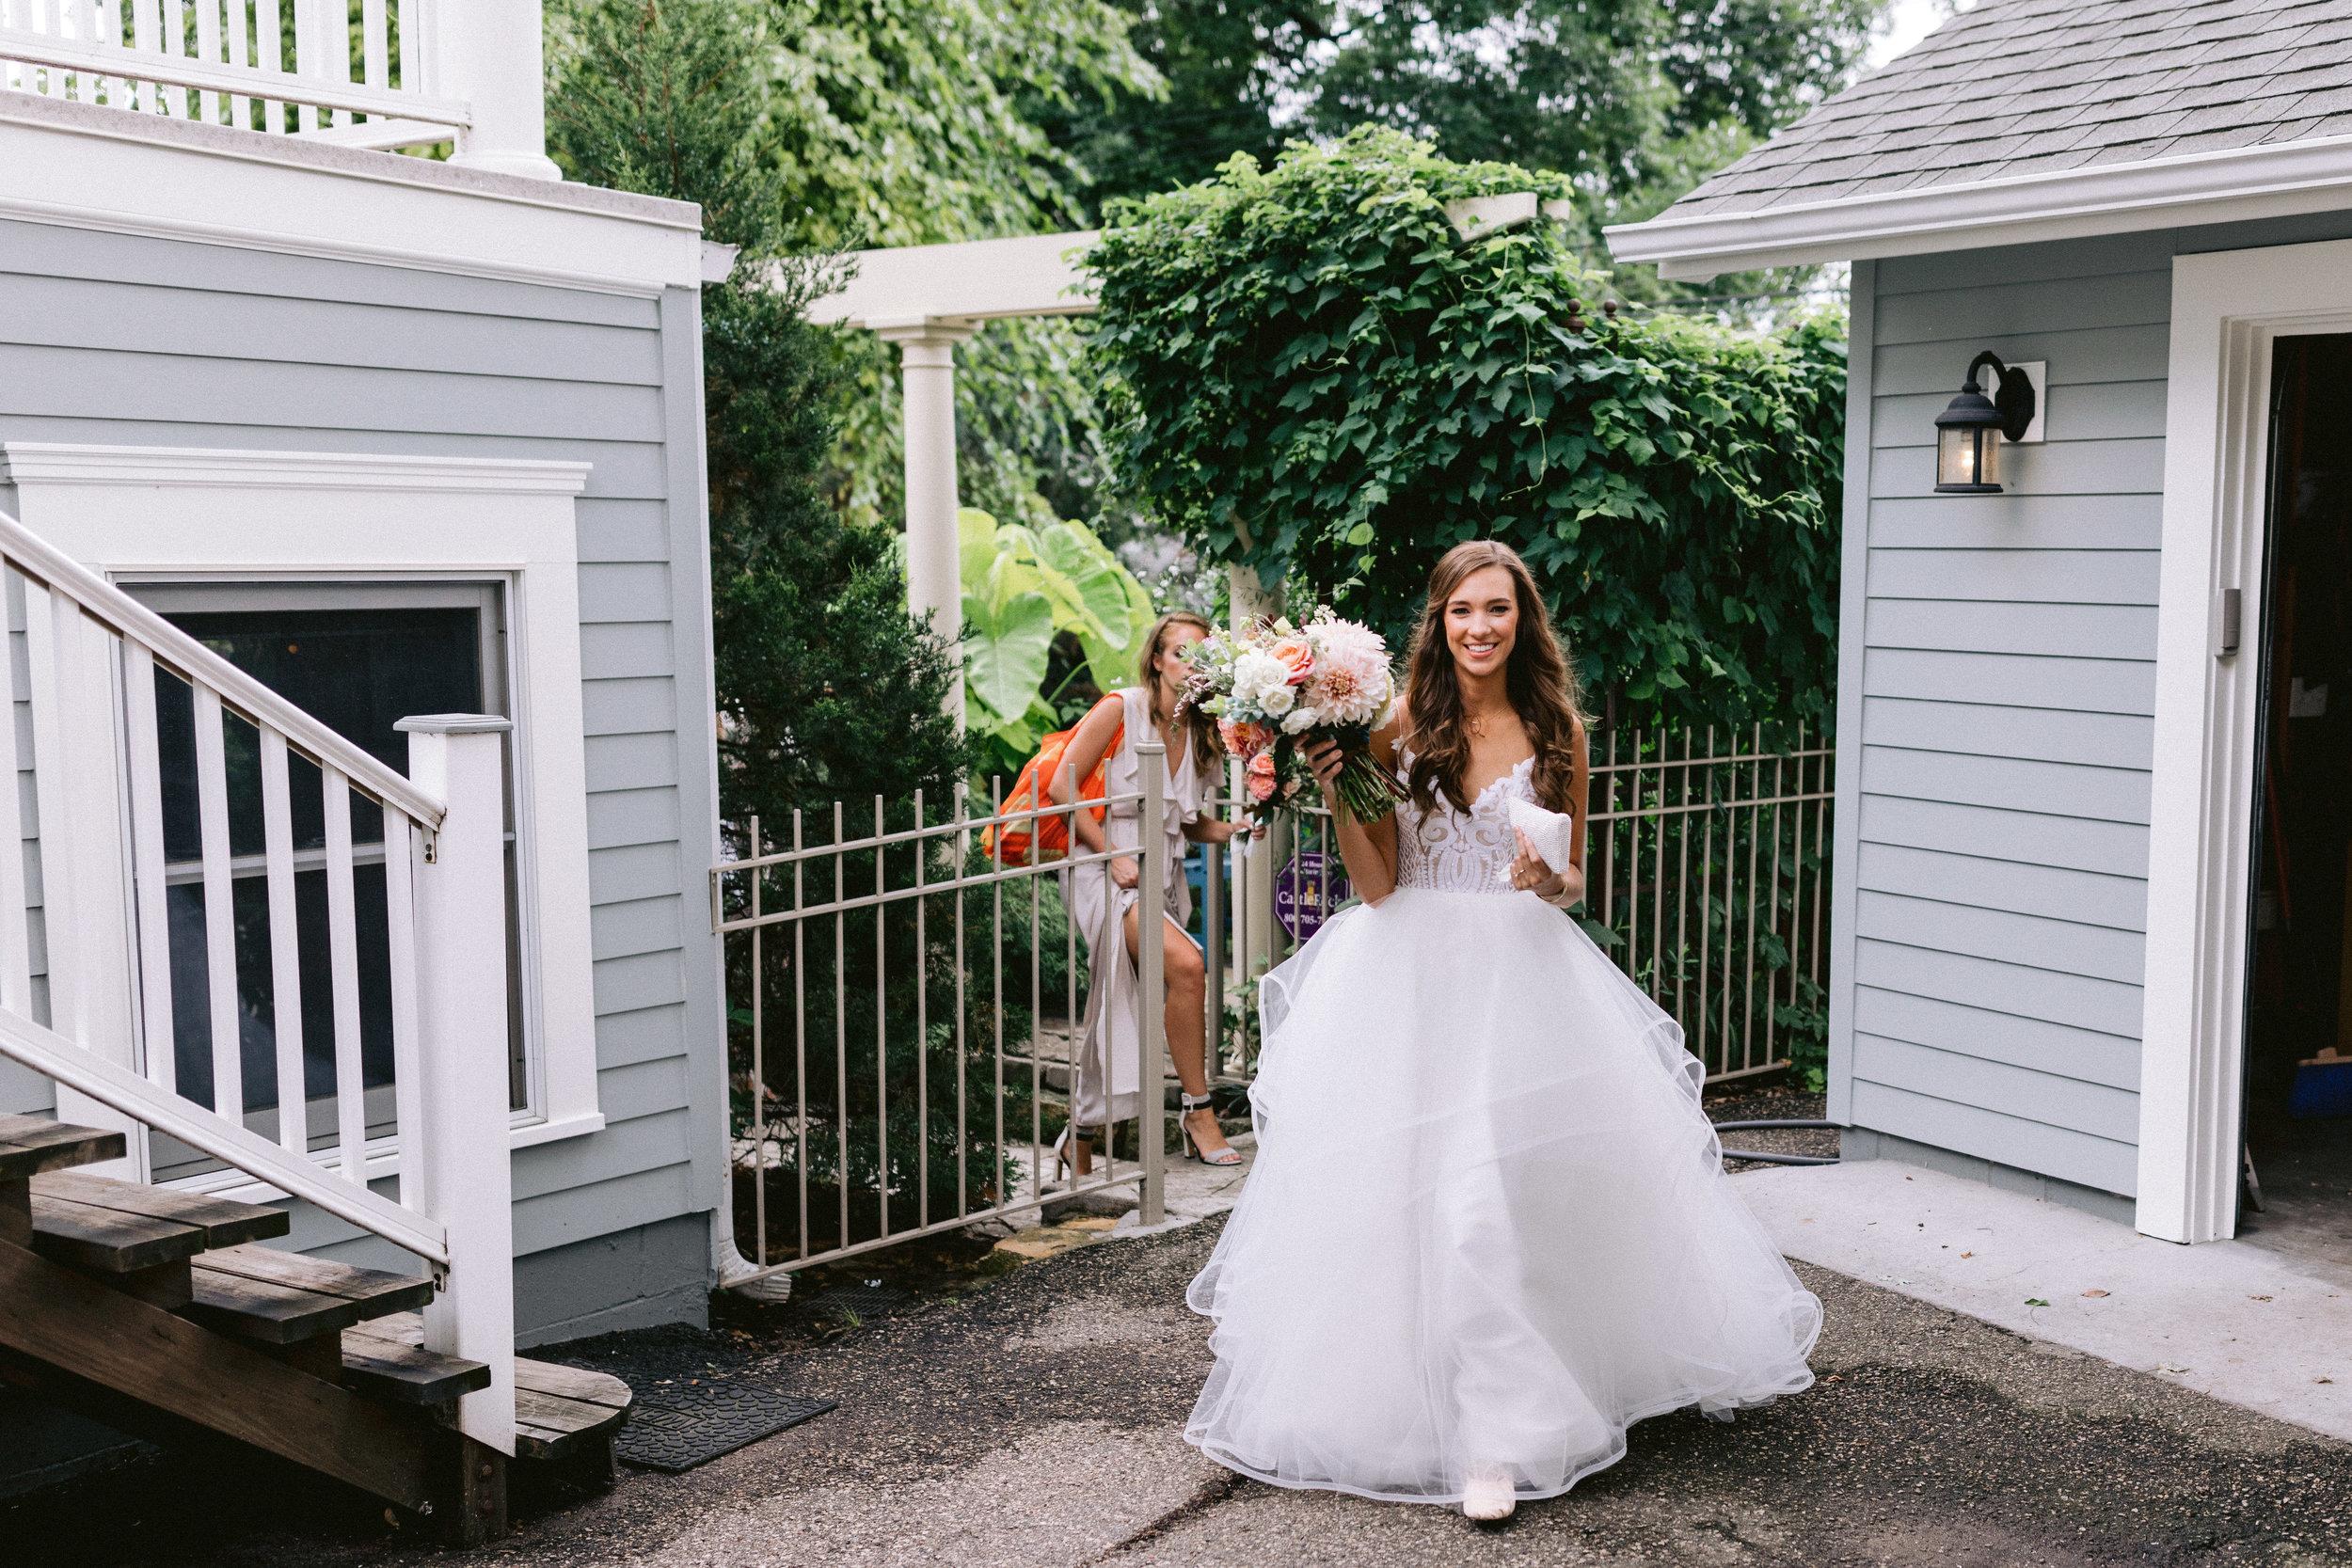 solarartsbychowgirlswedding-3.jpg